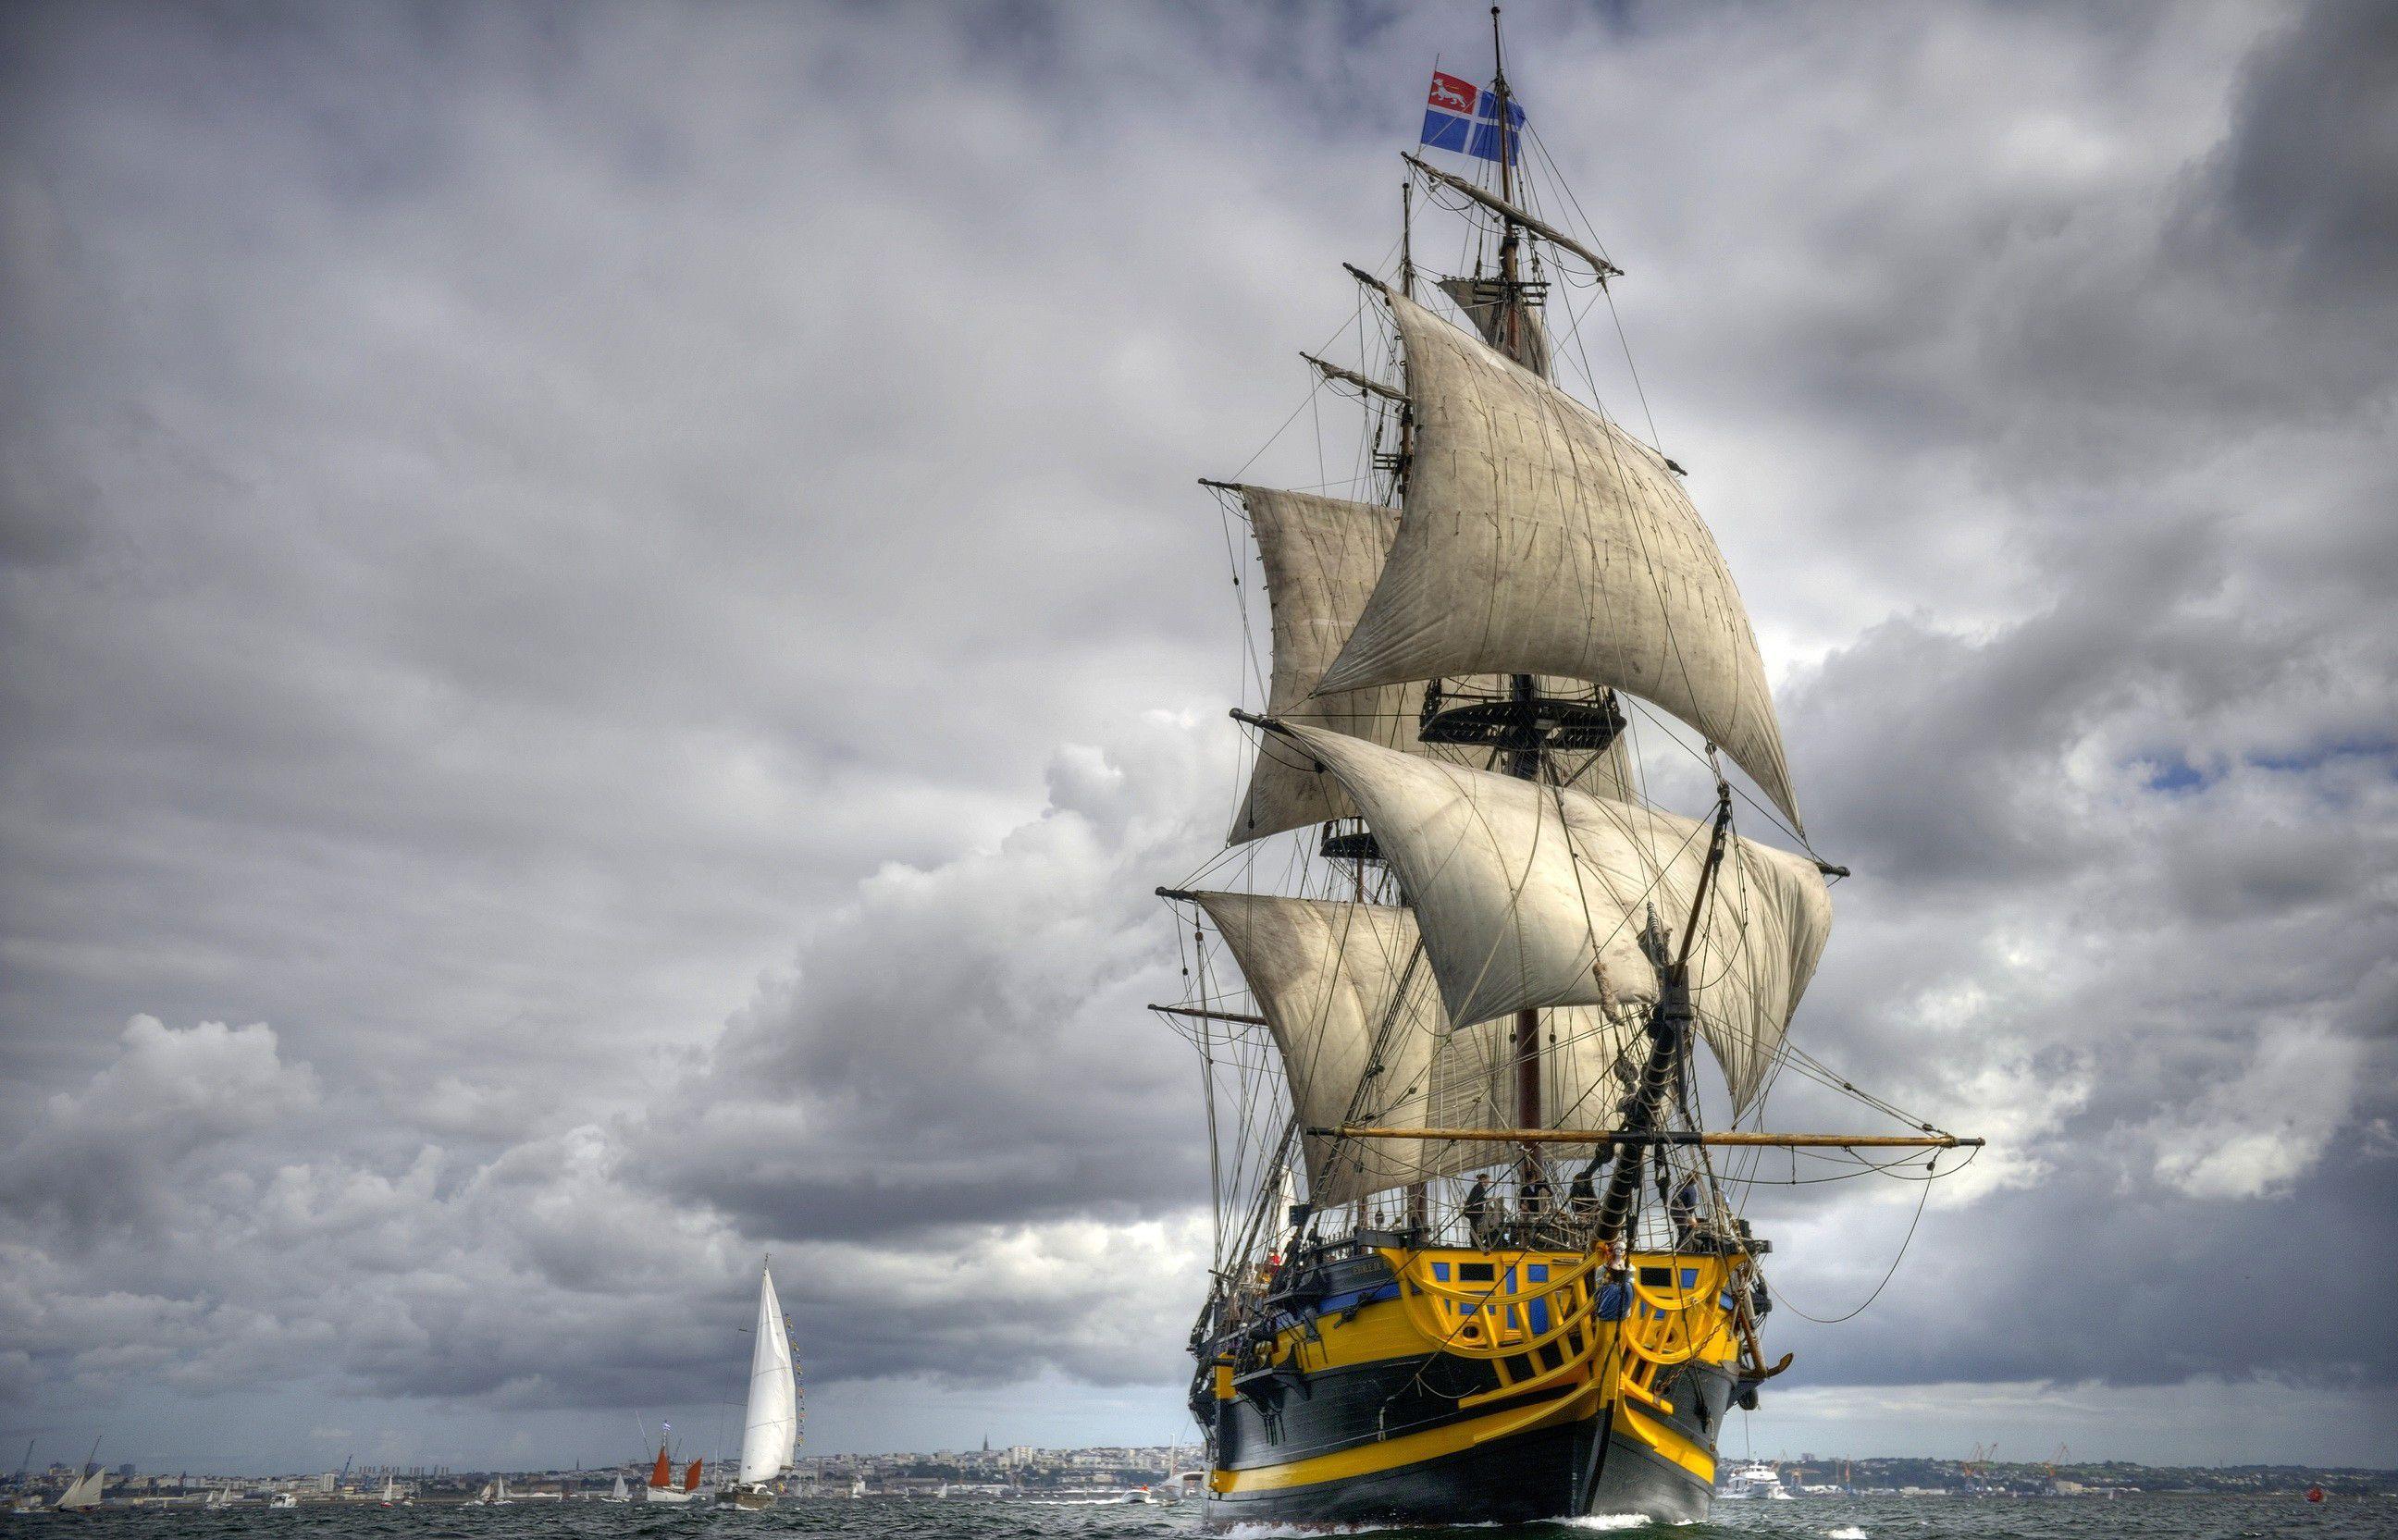 2592x1665 sailing ship wallpaper background image. view